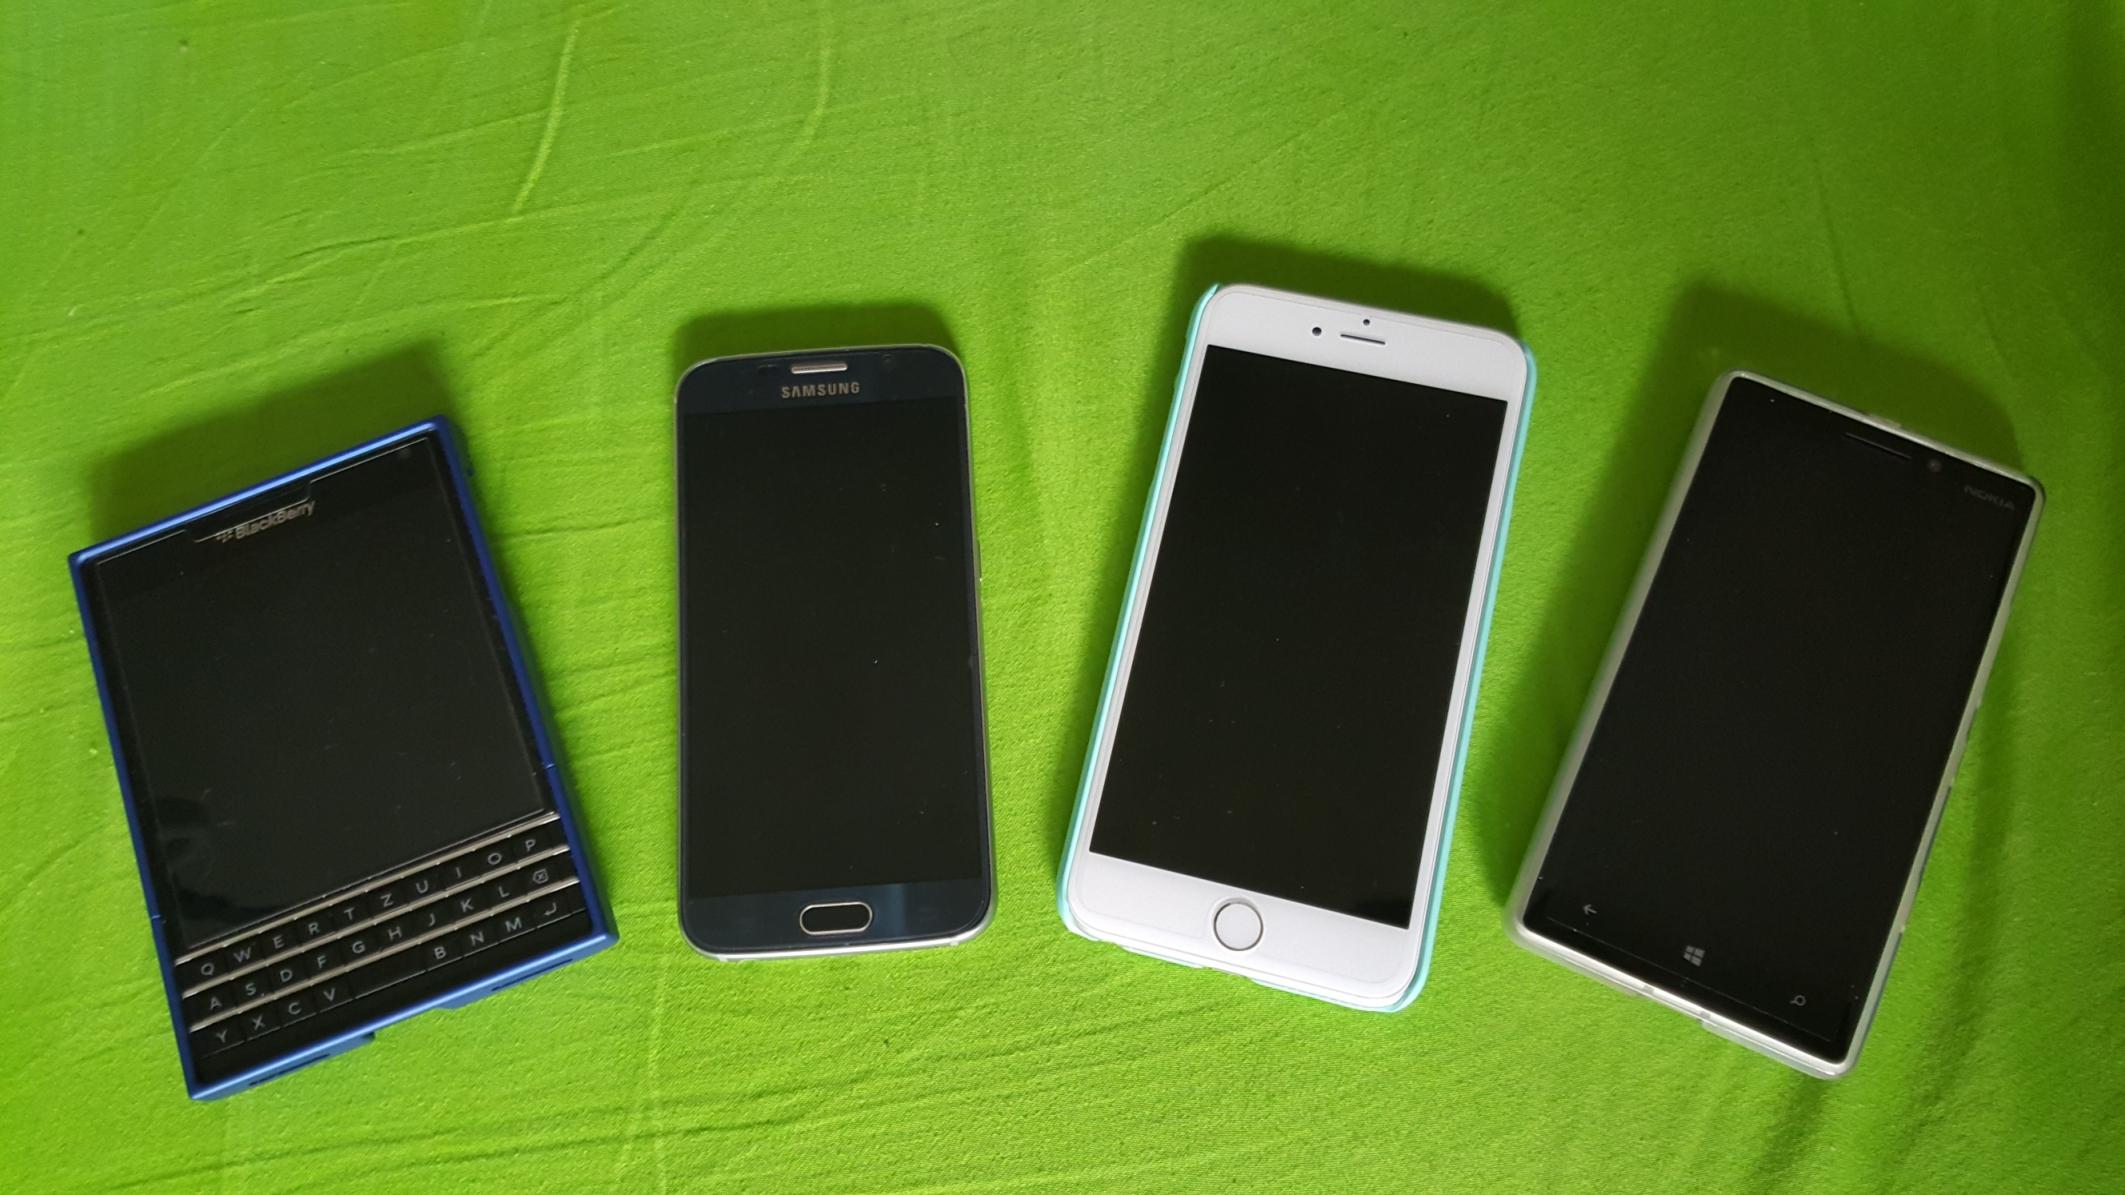 Ios Android Vergleich